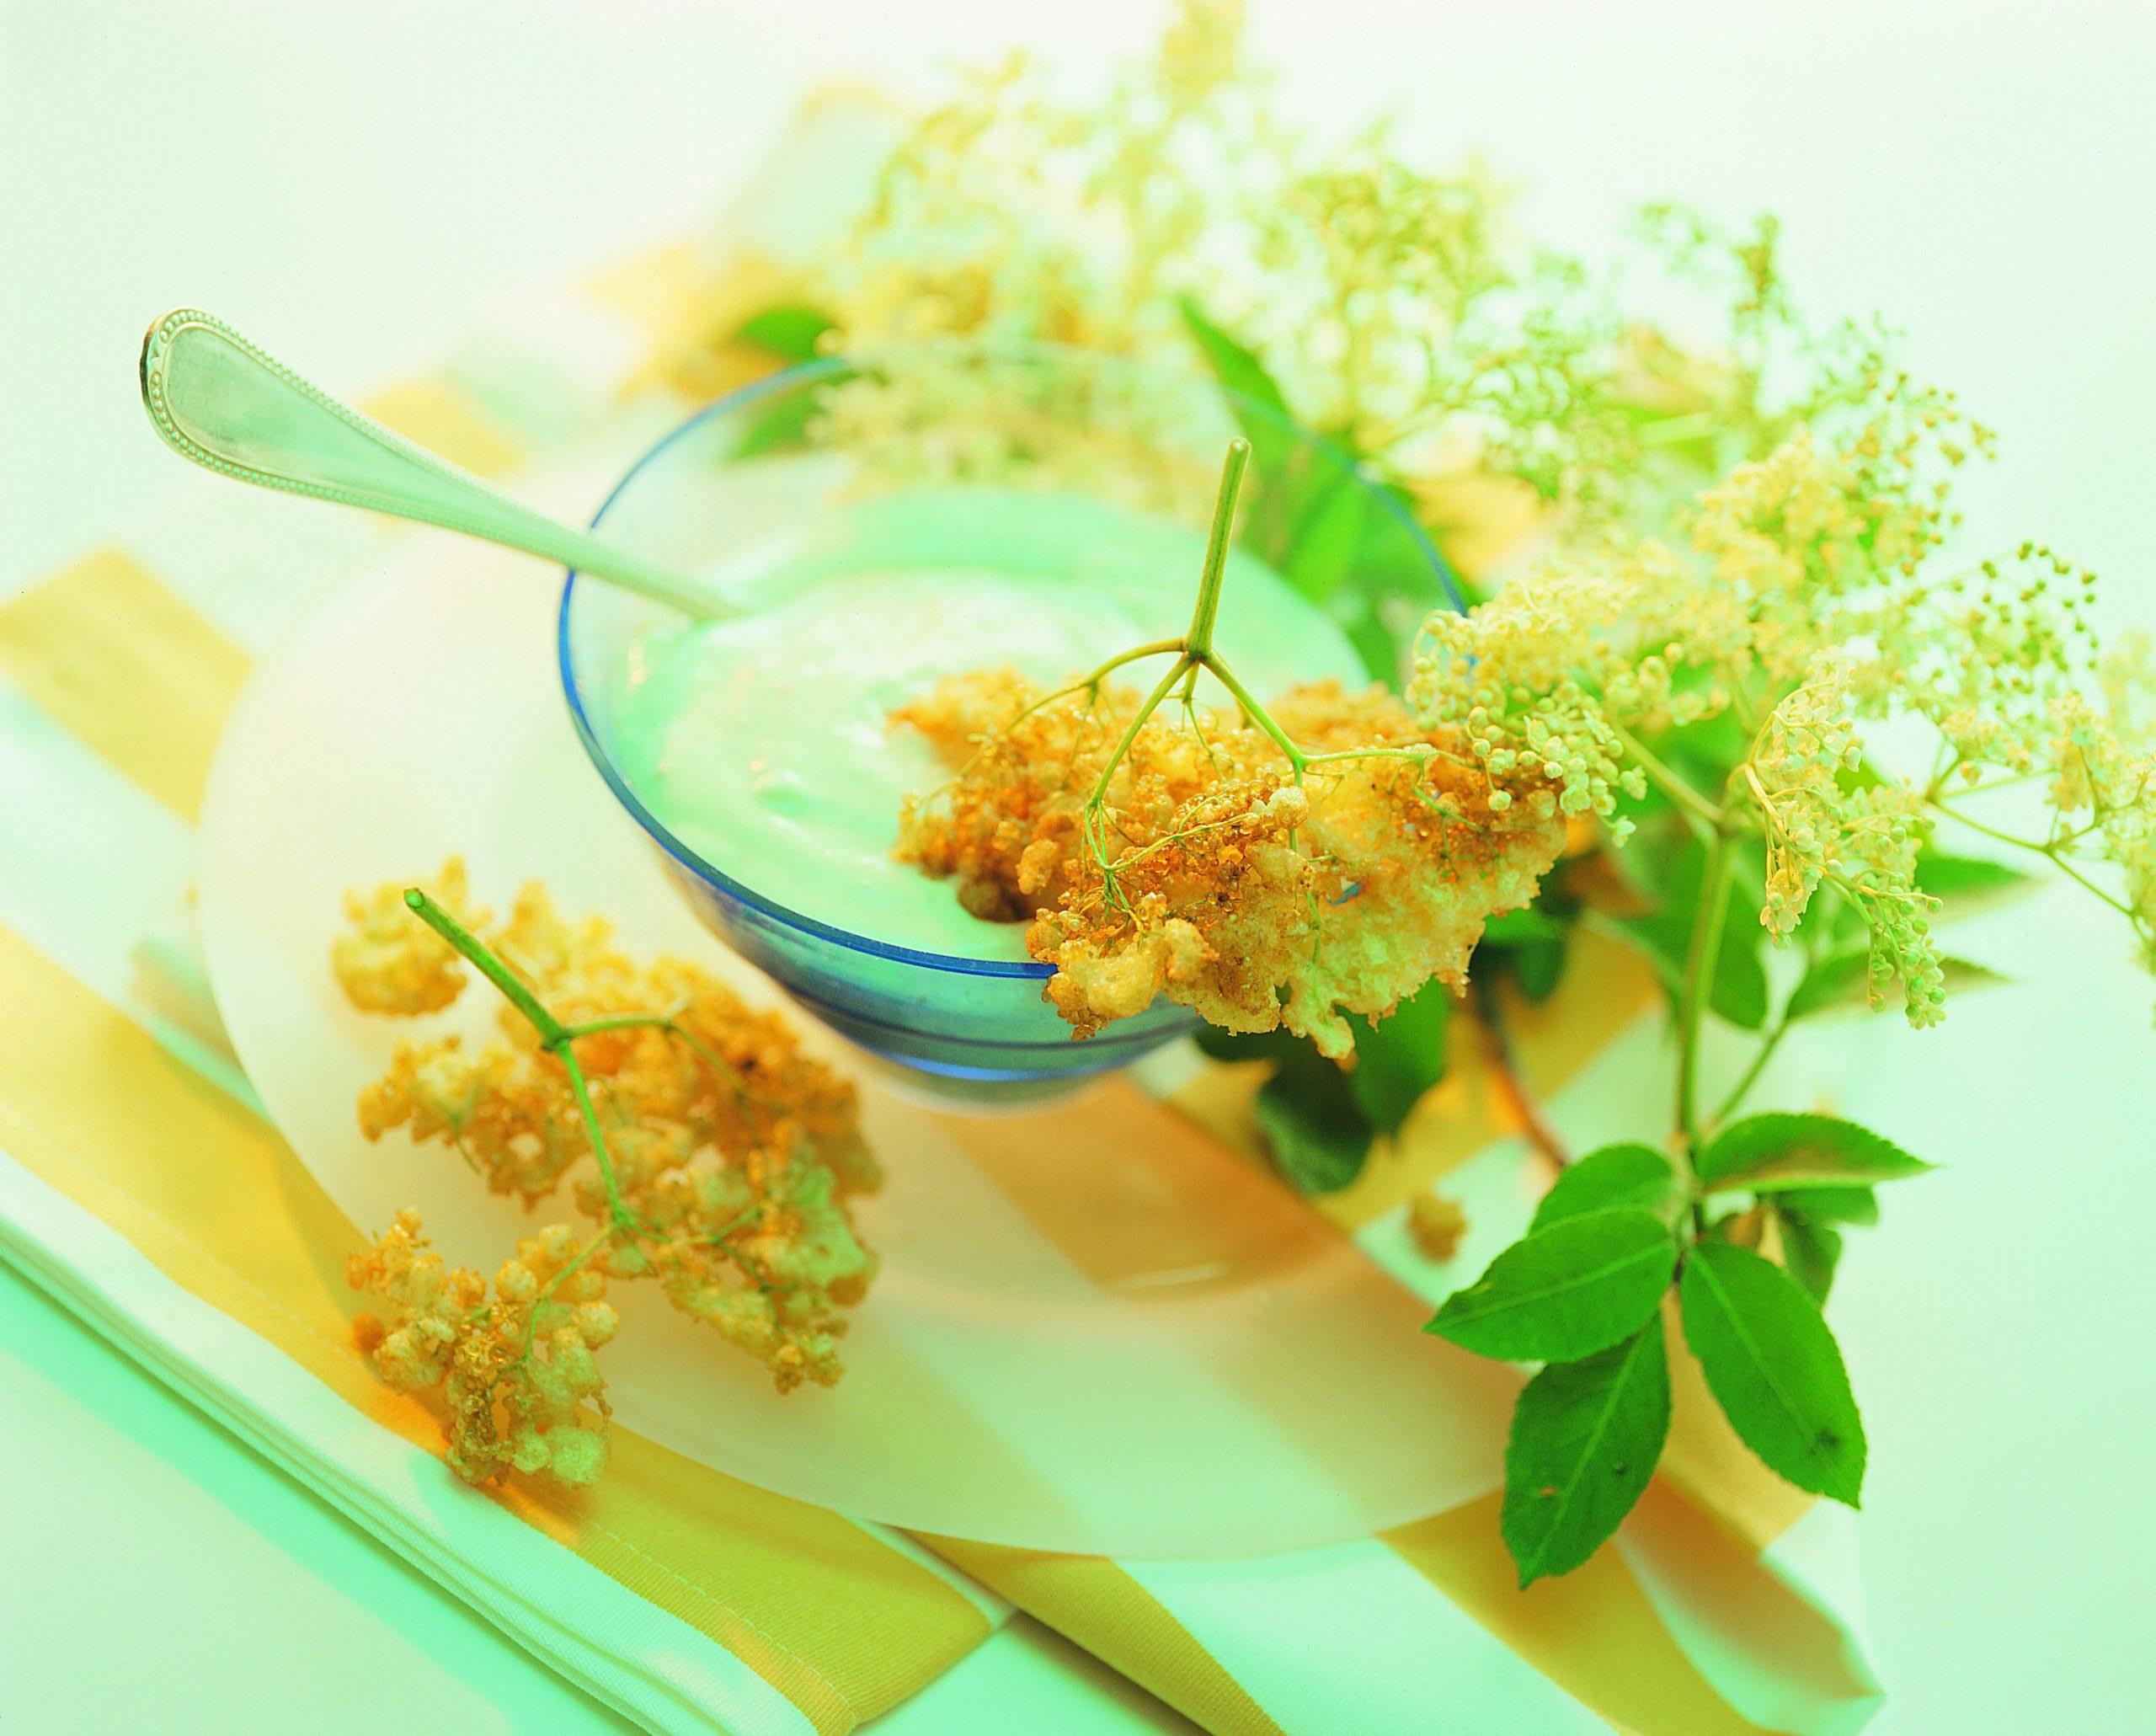 Holundercreme mit gebackenen Blüten